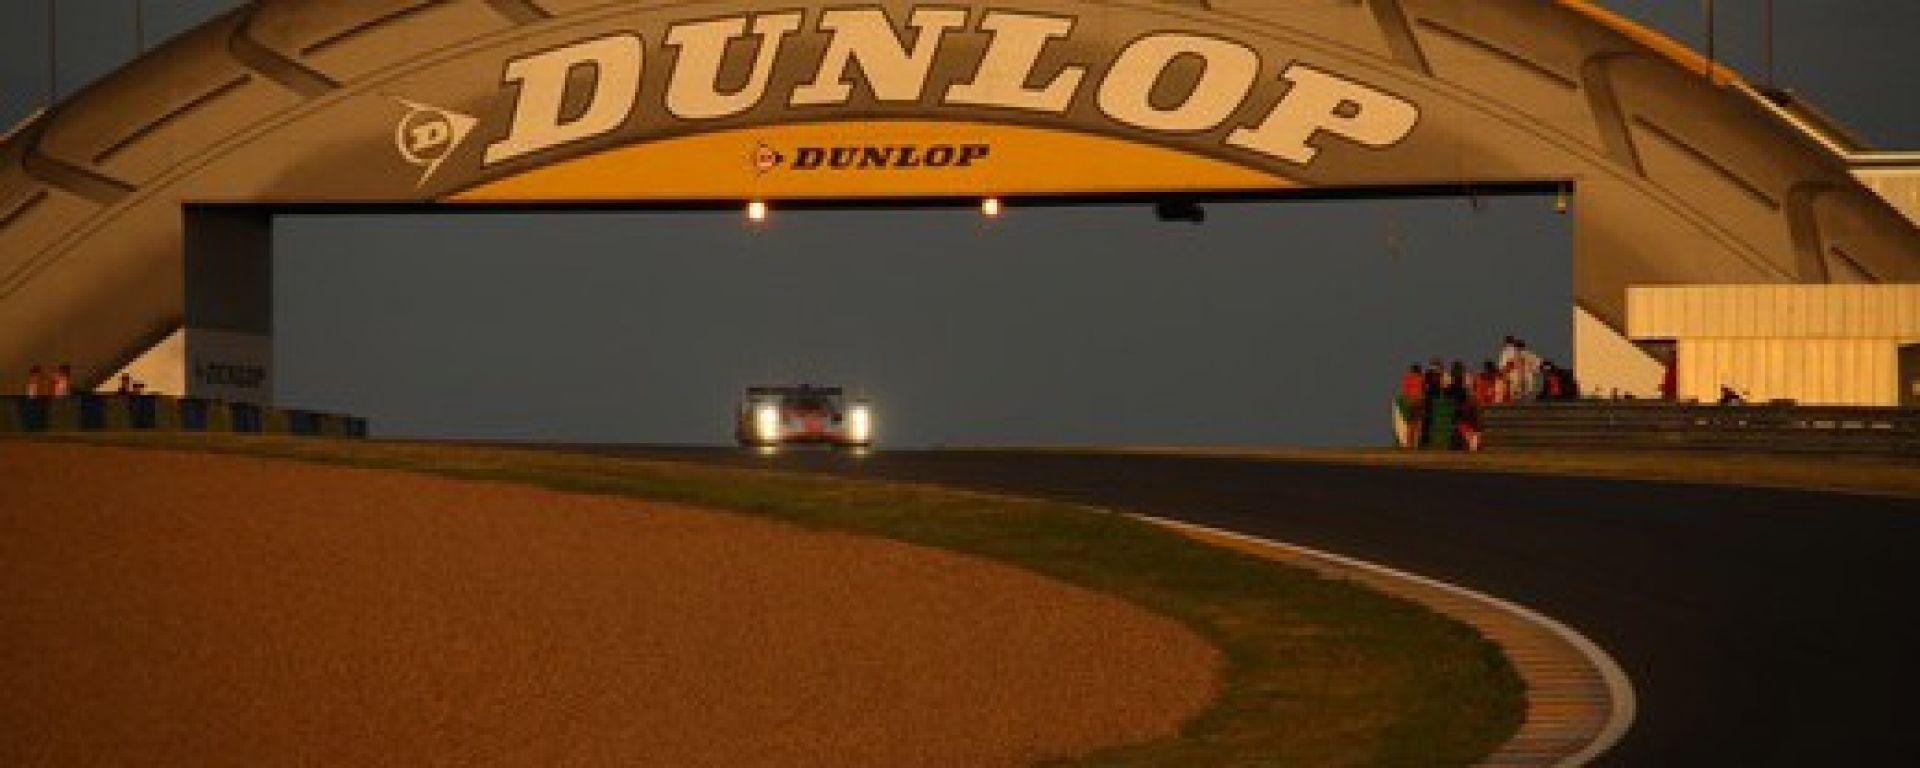 Le Mans 2009 in 200 immagini